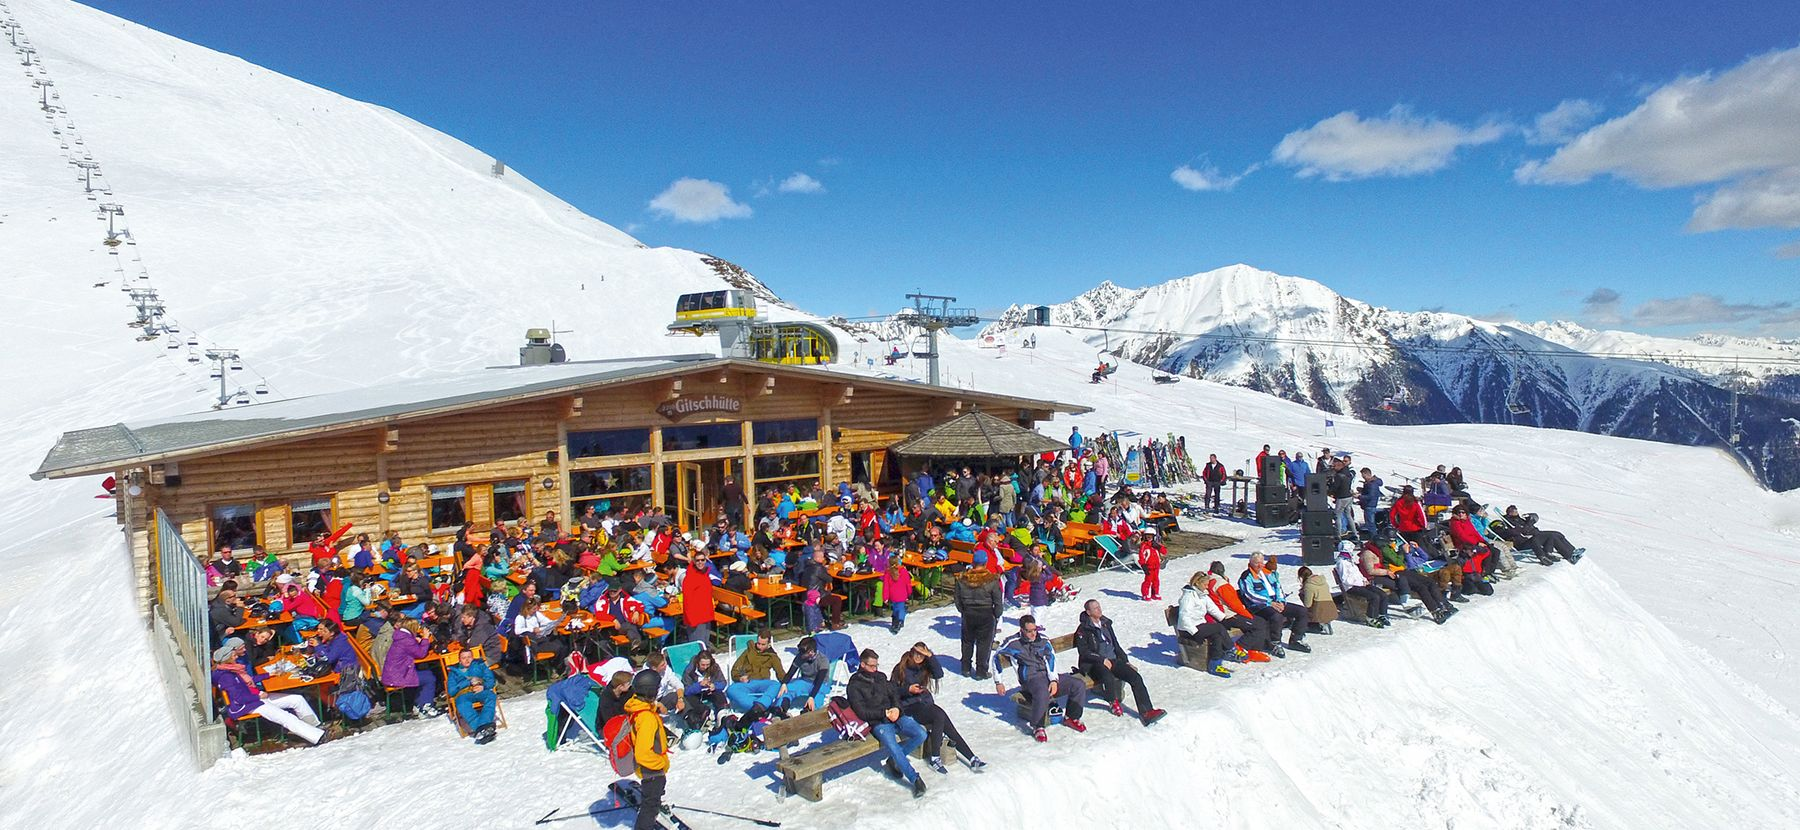 the gitschhütte in the hiking region and skiing resort of gitschberg